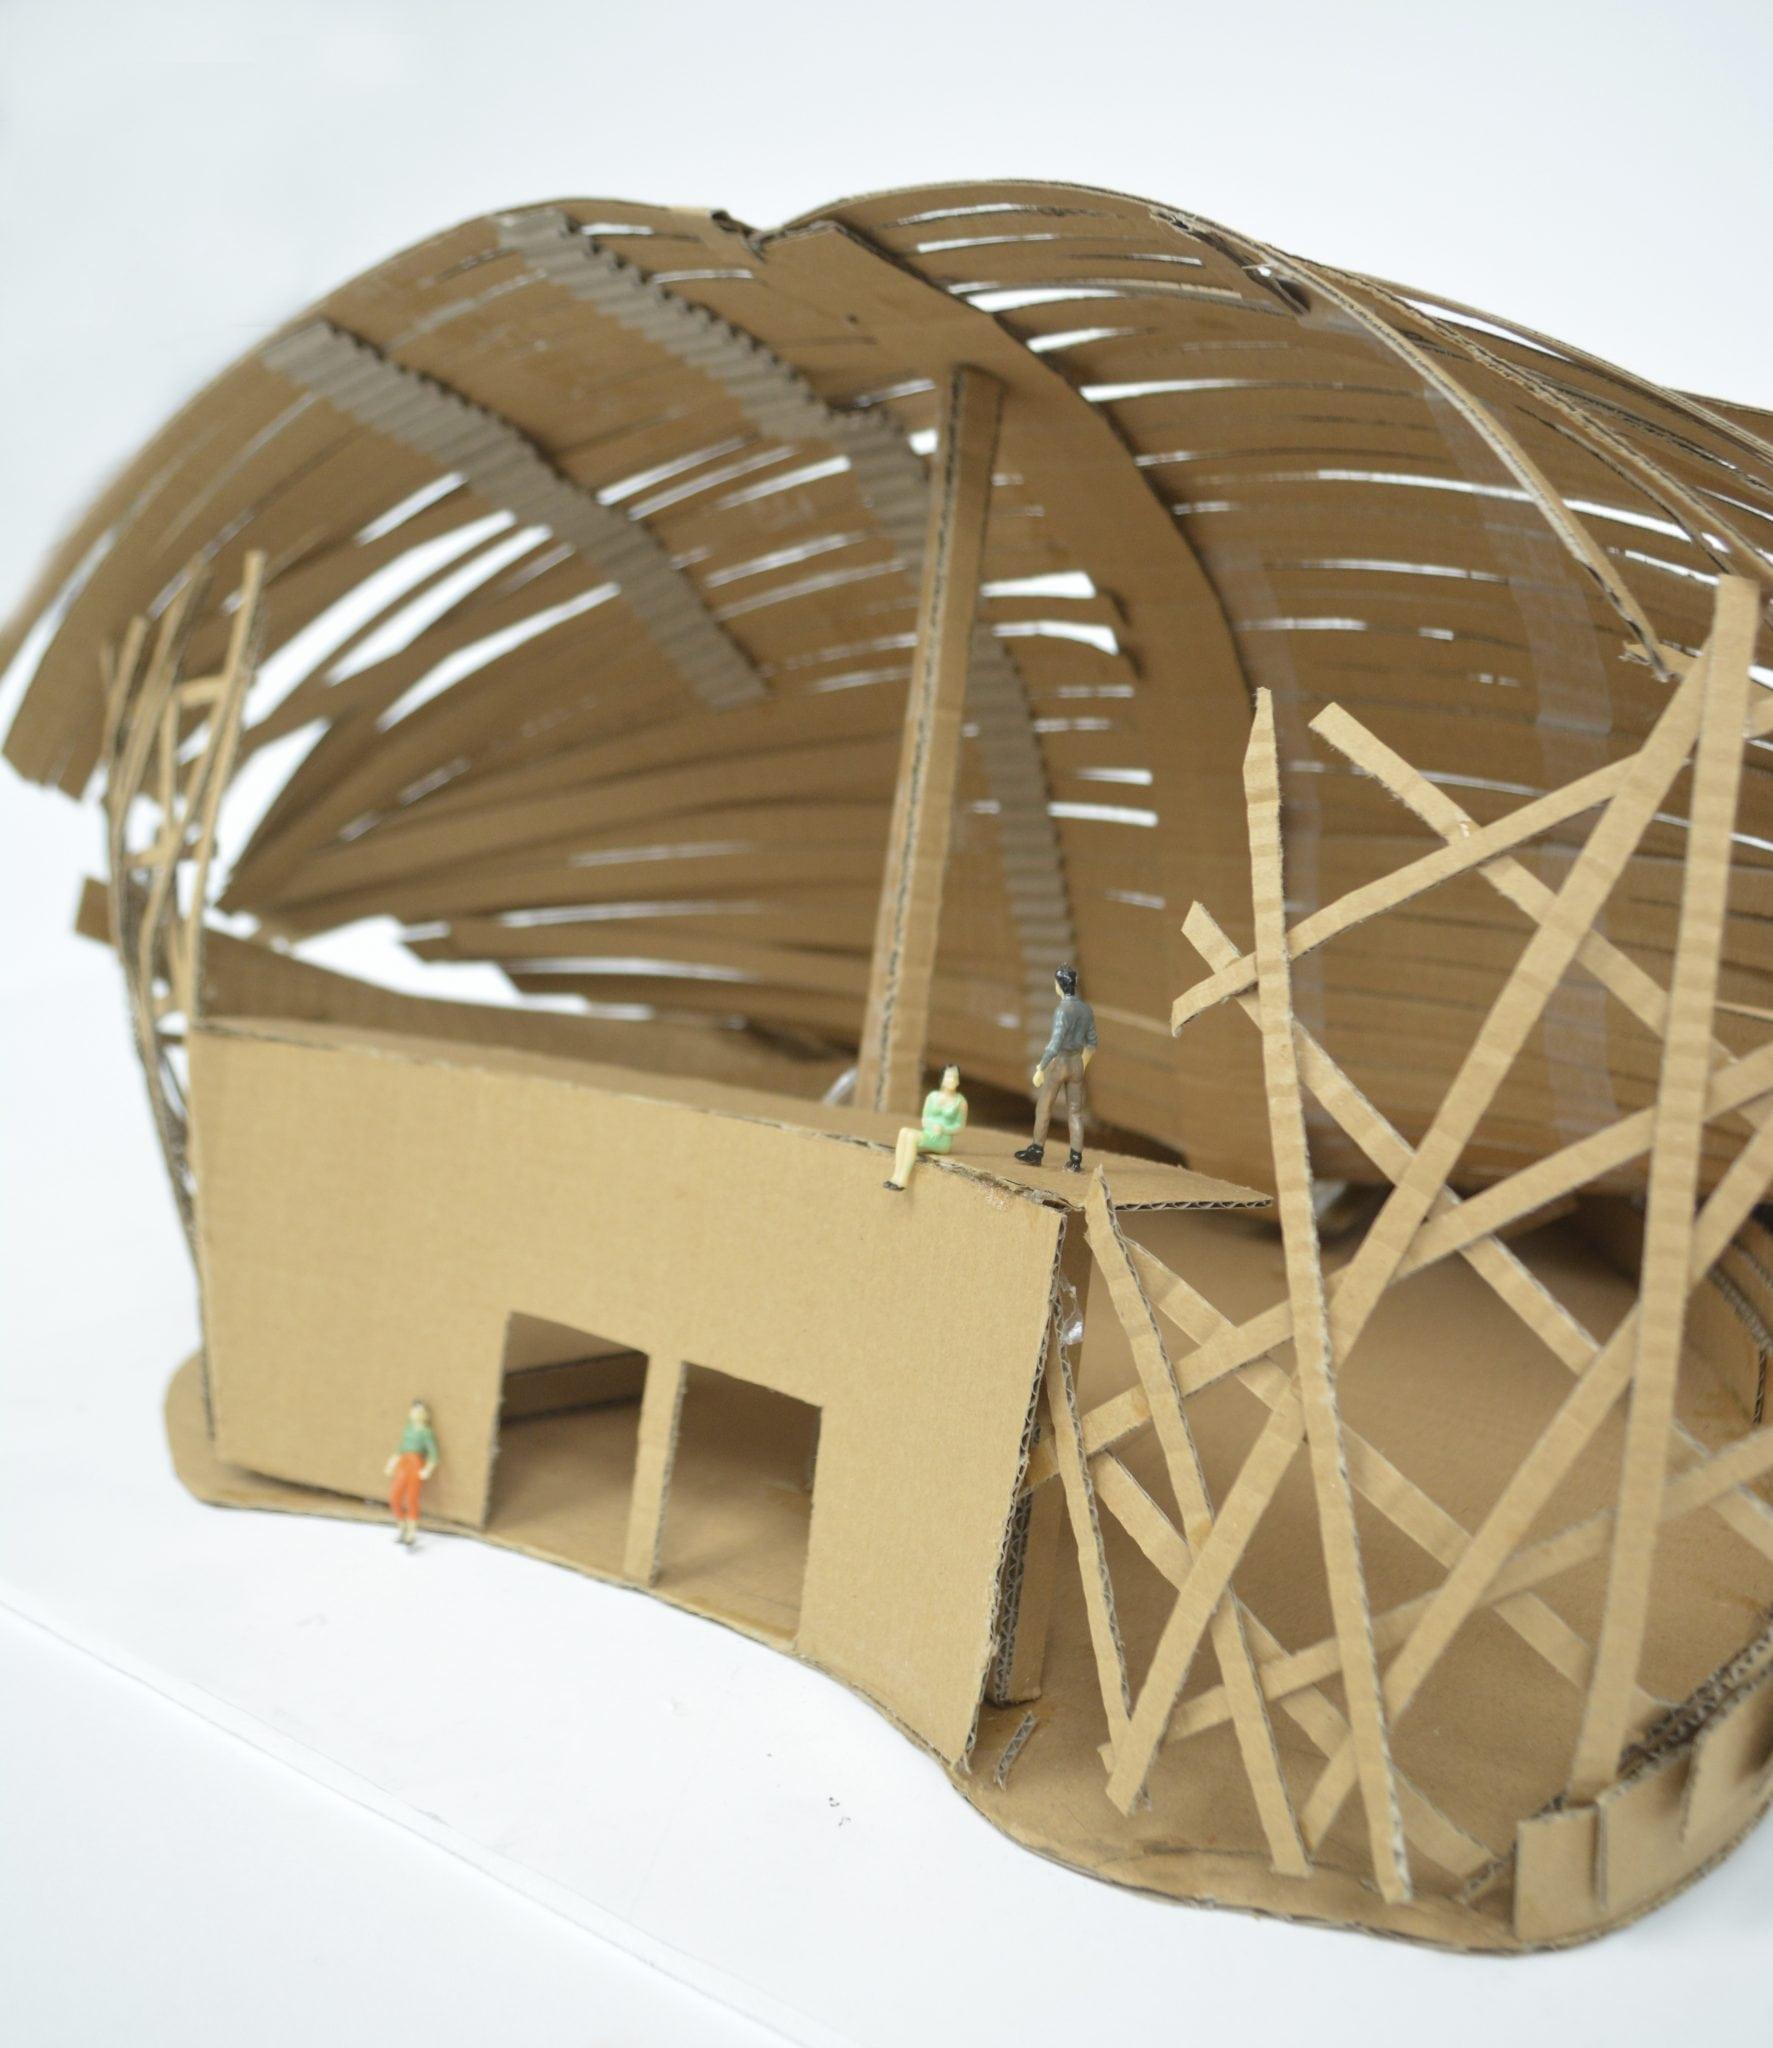 Interior Architecture students create Cardboard City